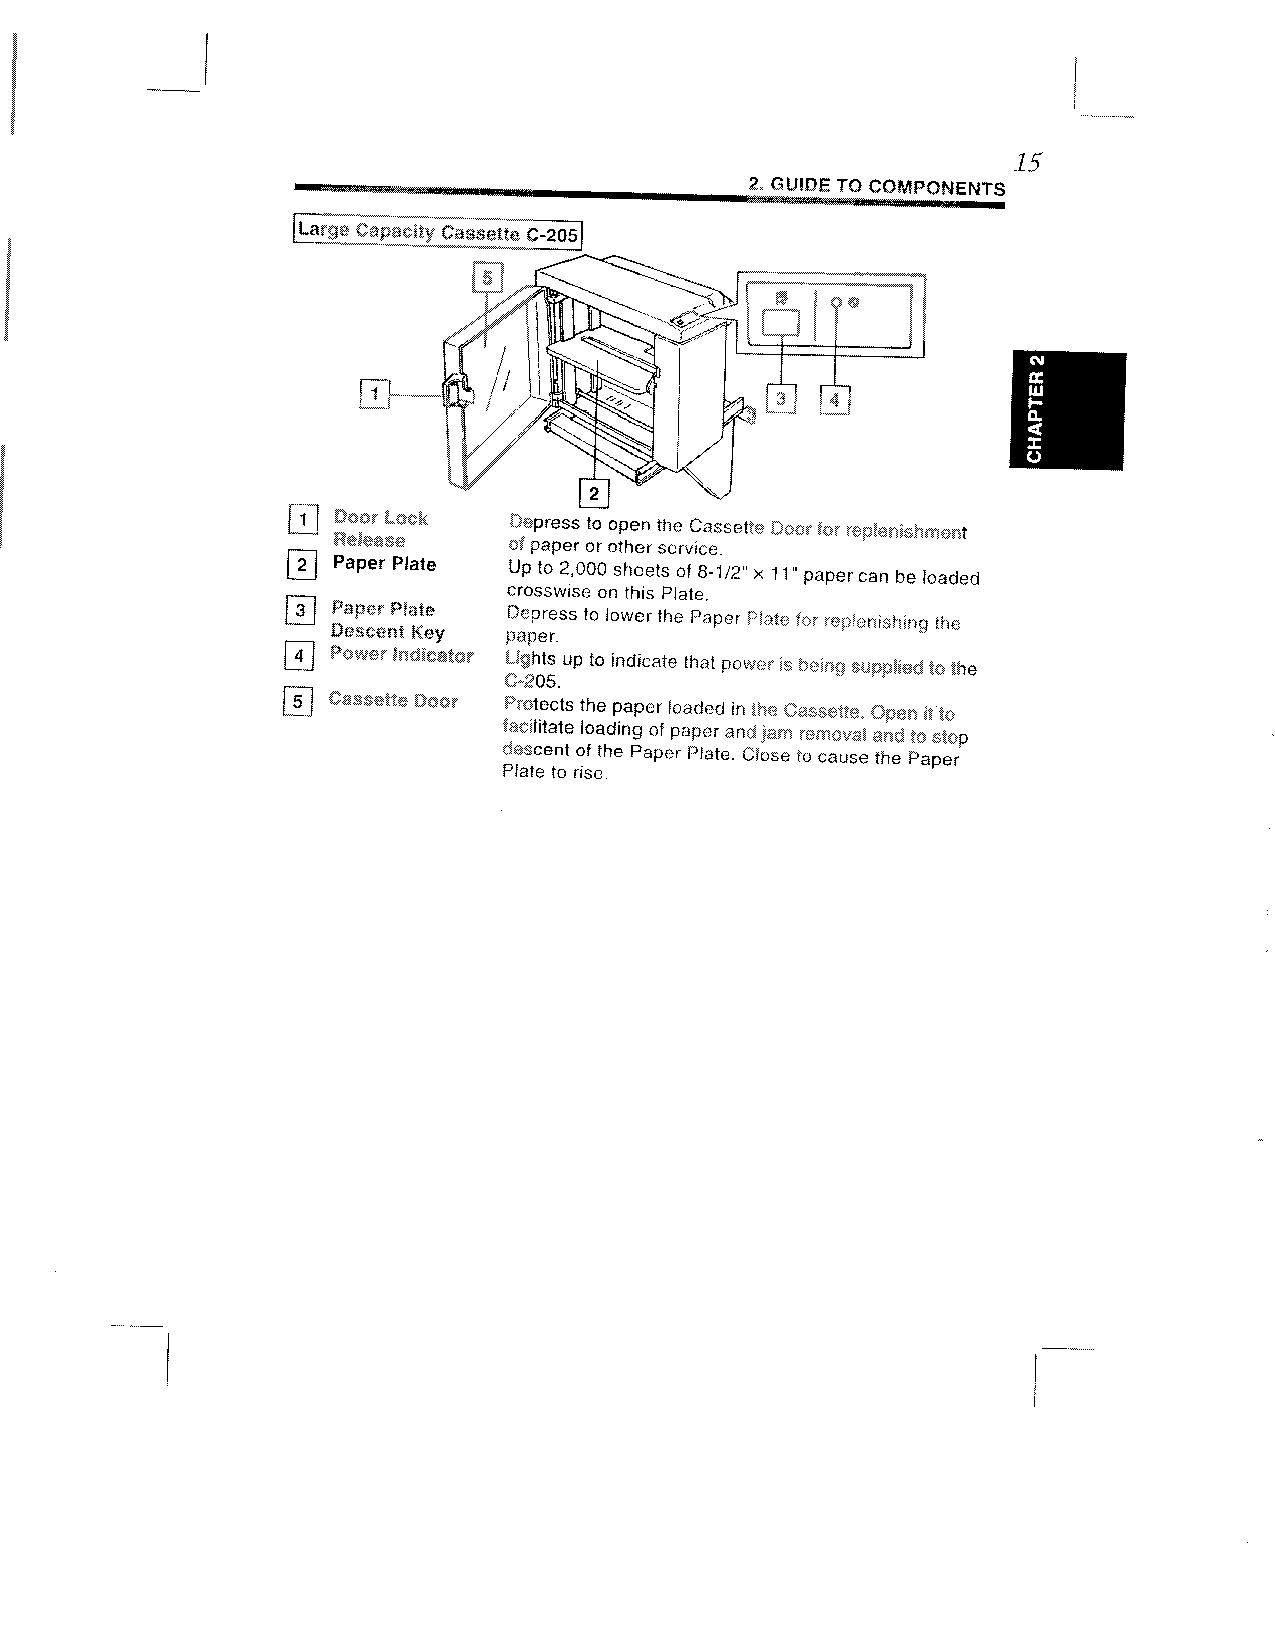 Konica Minolta EP8602 User Manual